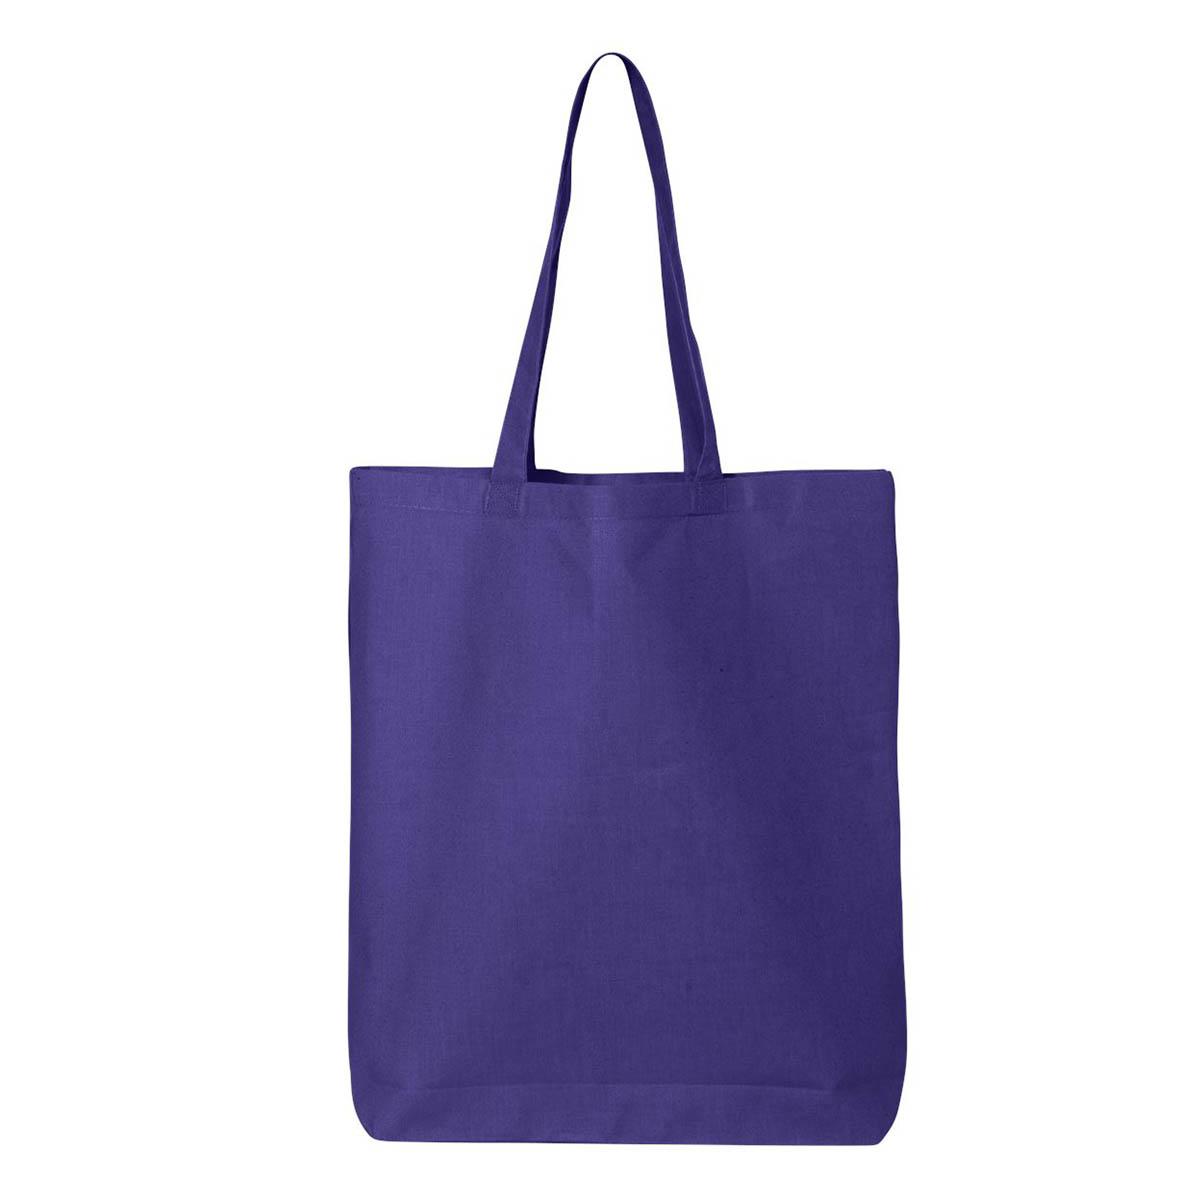 Purple lightweight gusset